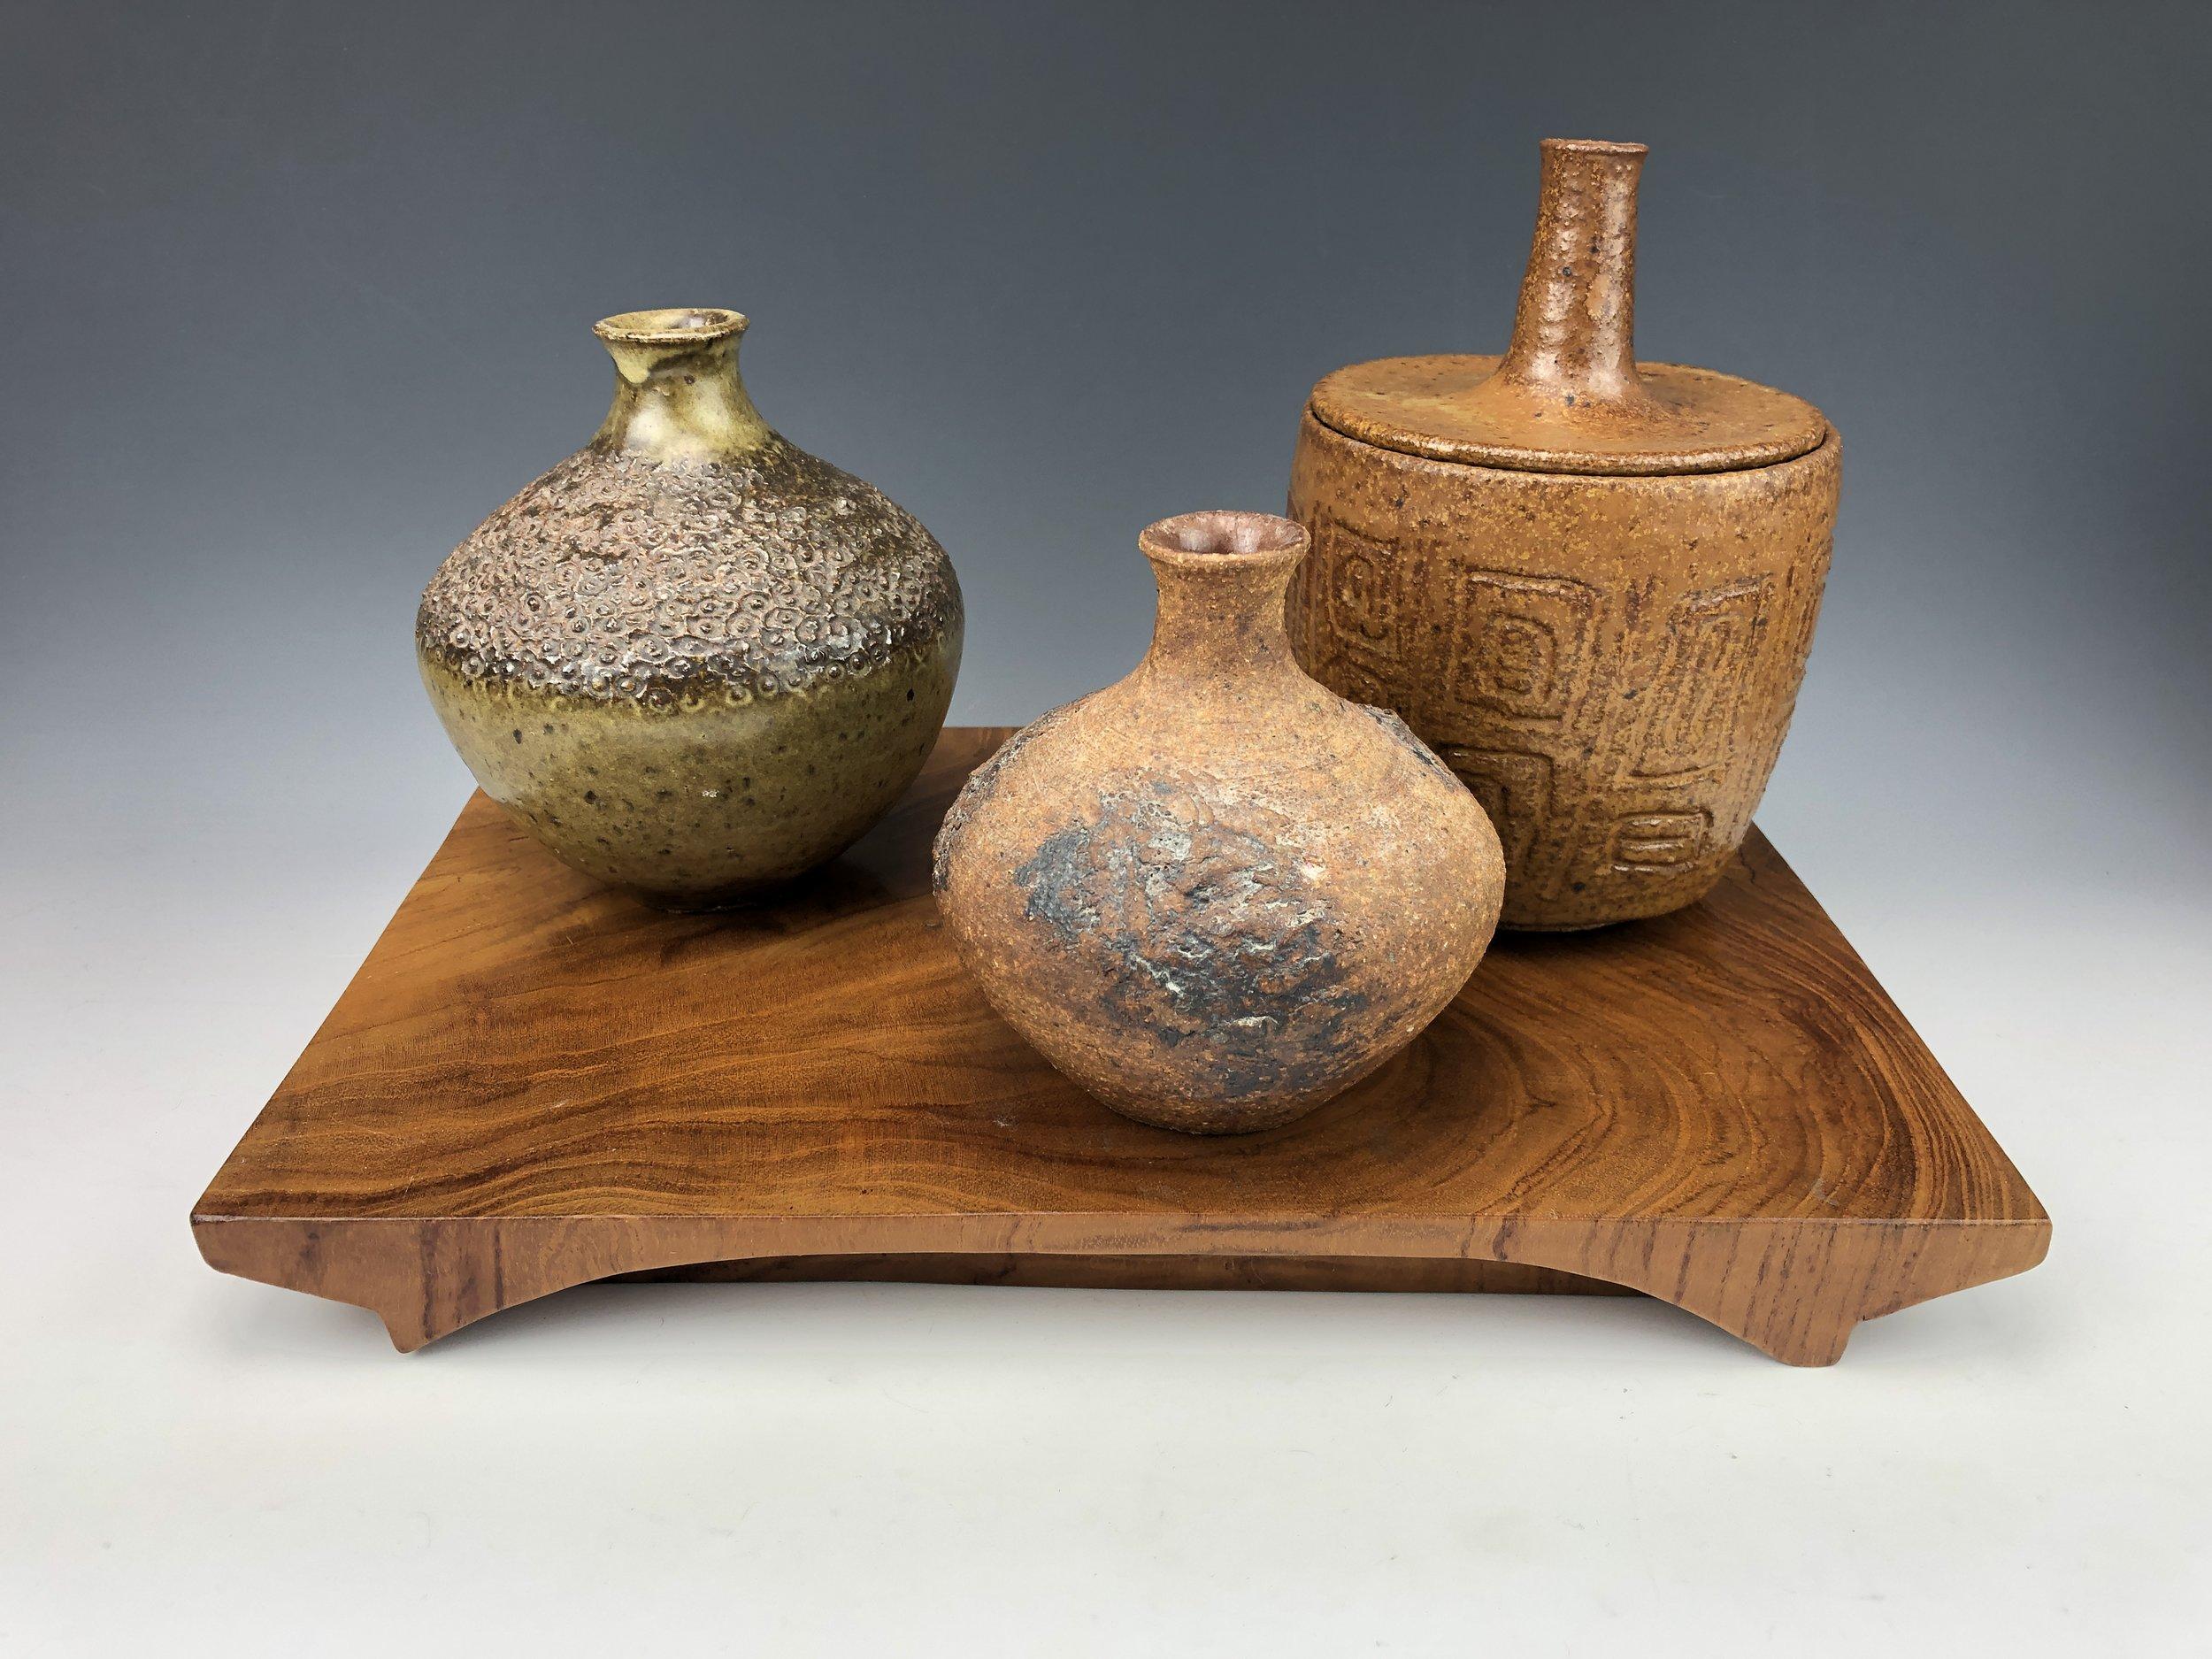 Bill Argonza - Mid-Century Modern ceramics, decorative and fine art and furnishings